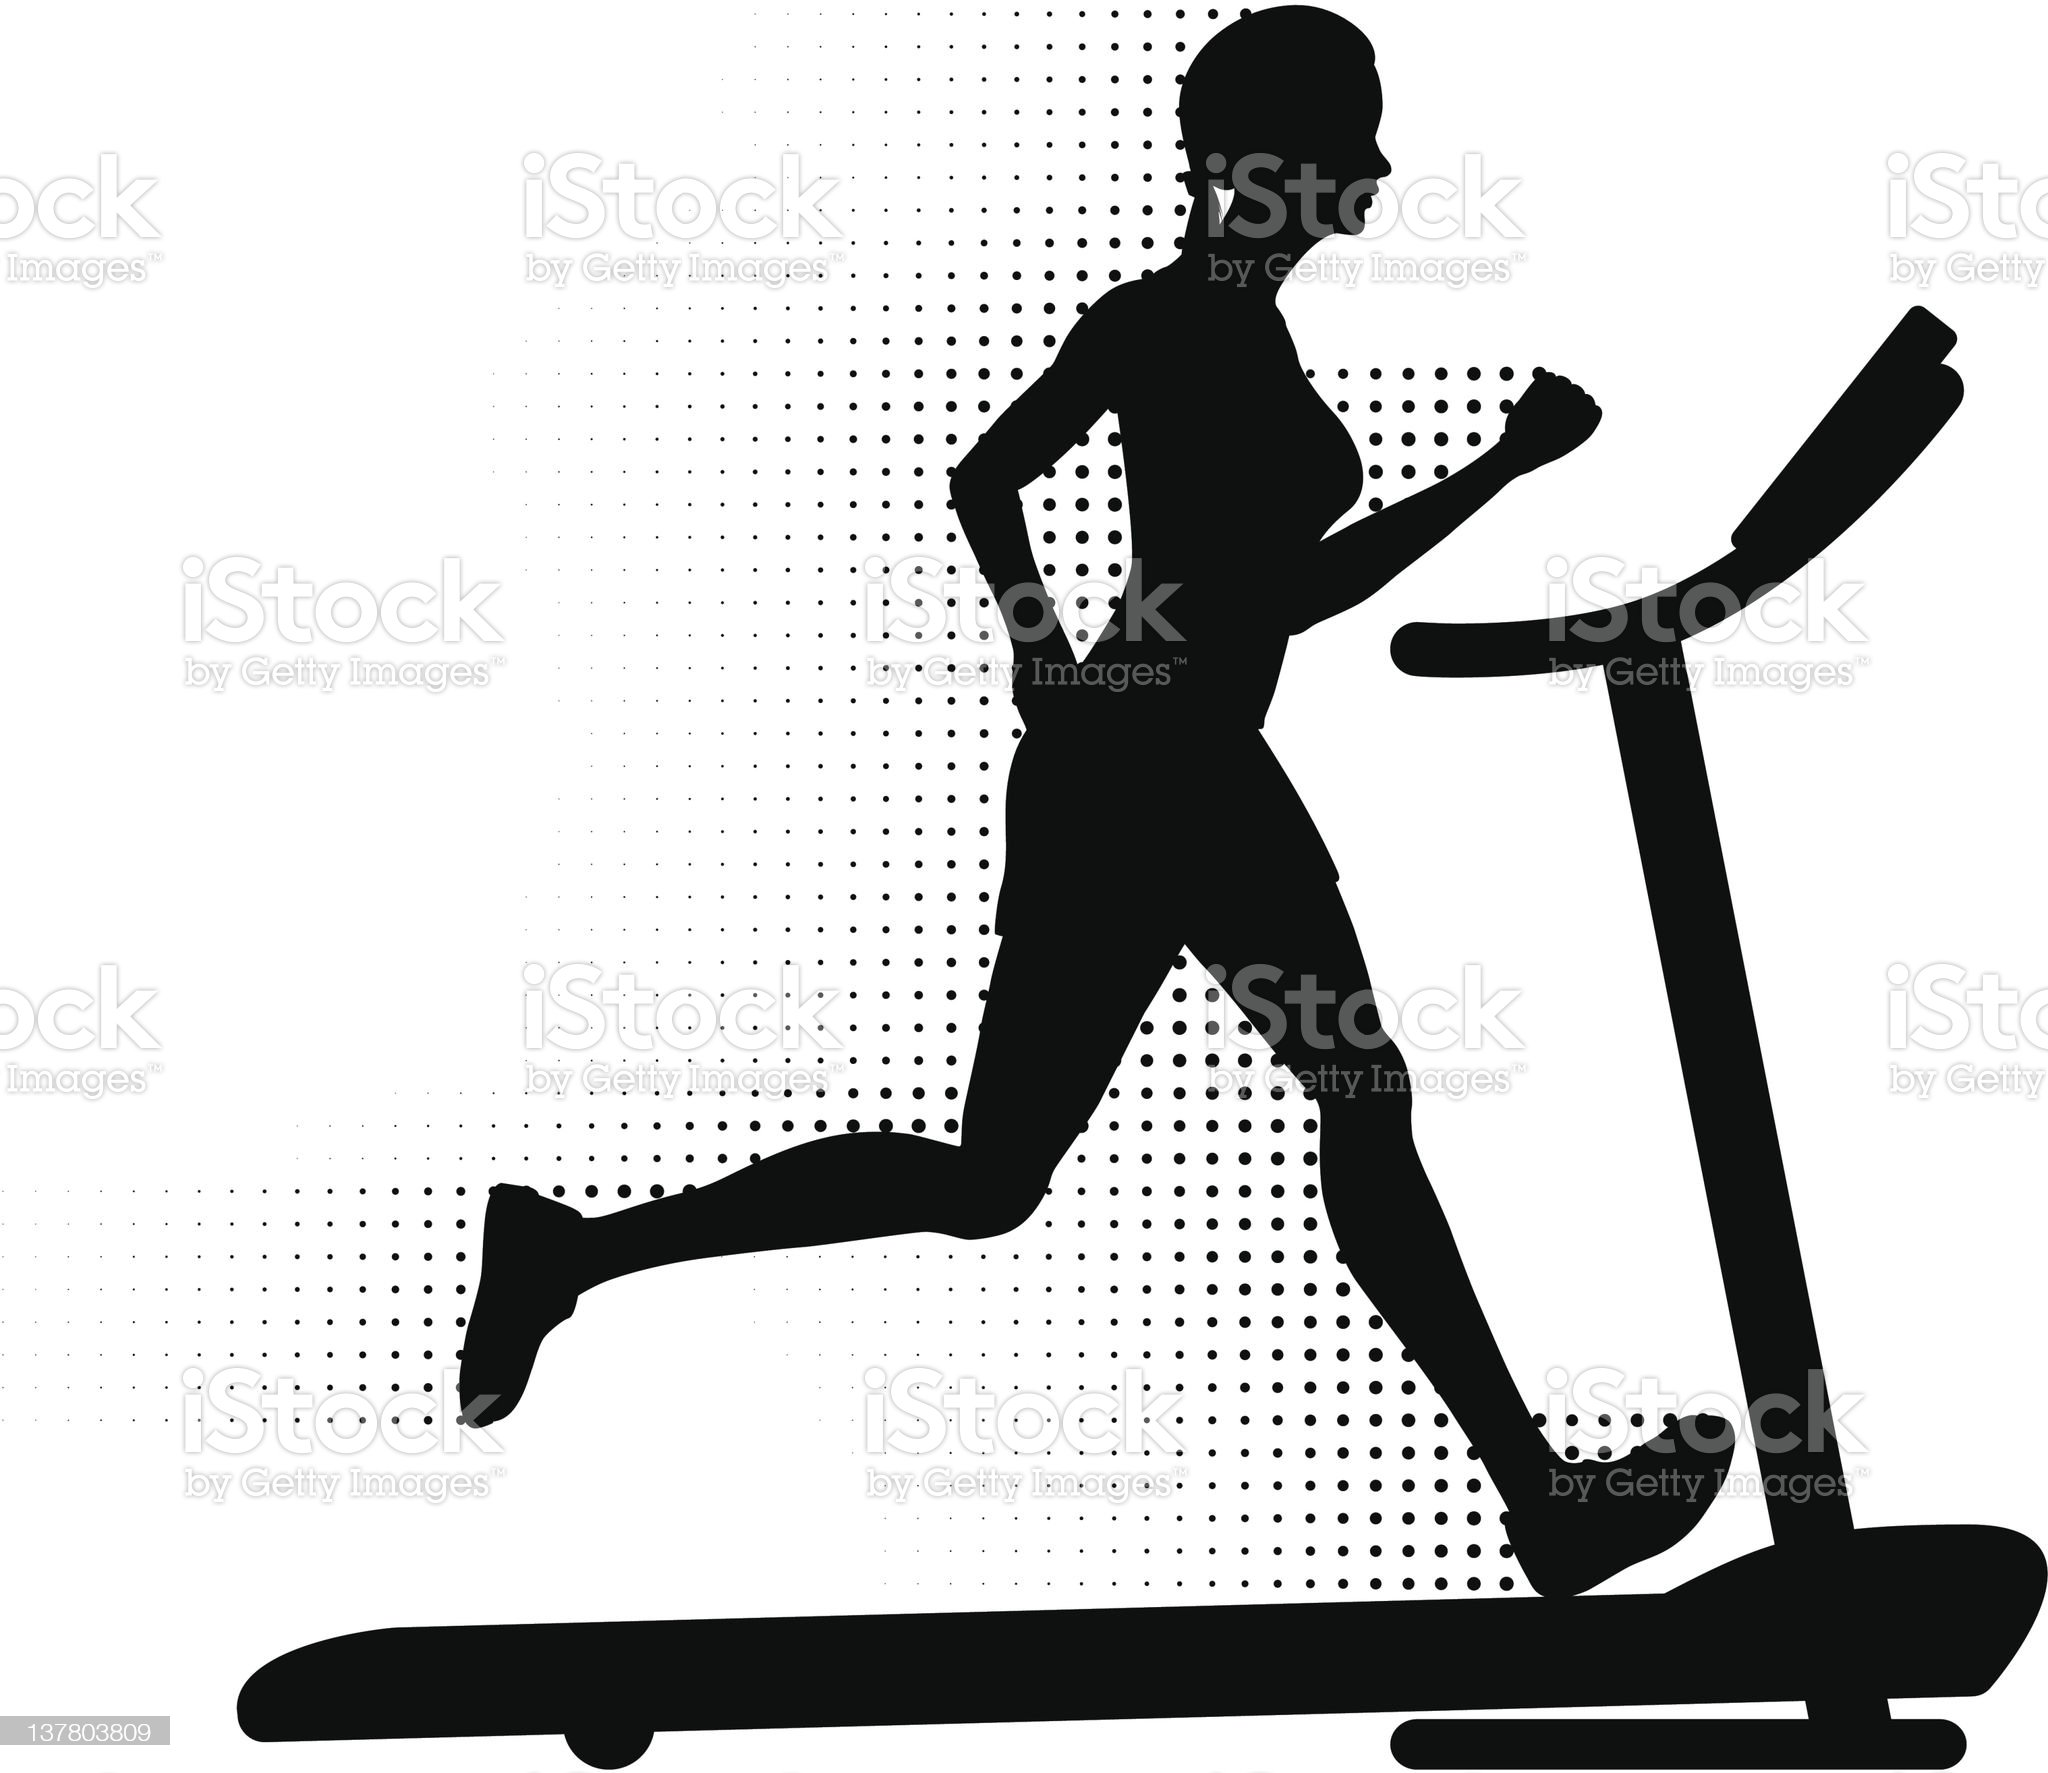 Woman Running on a Treadmill royalty-free stock vector art